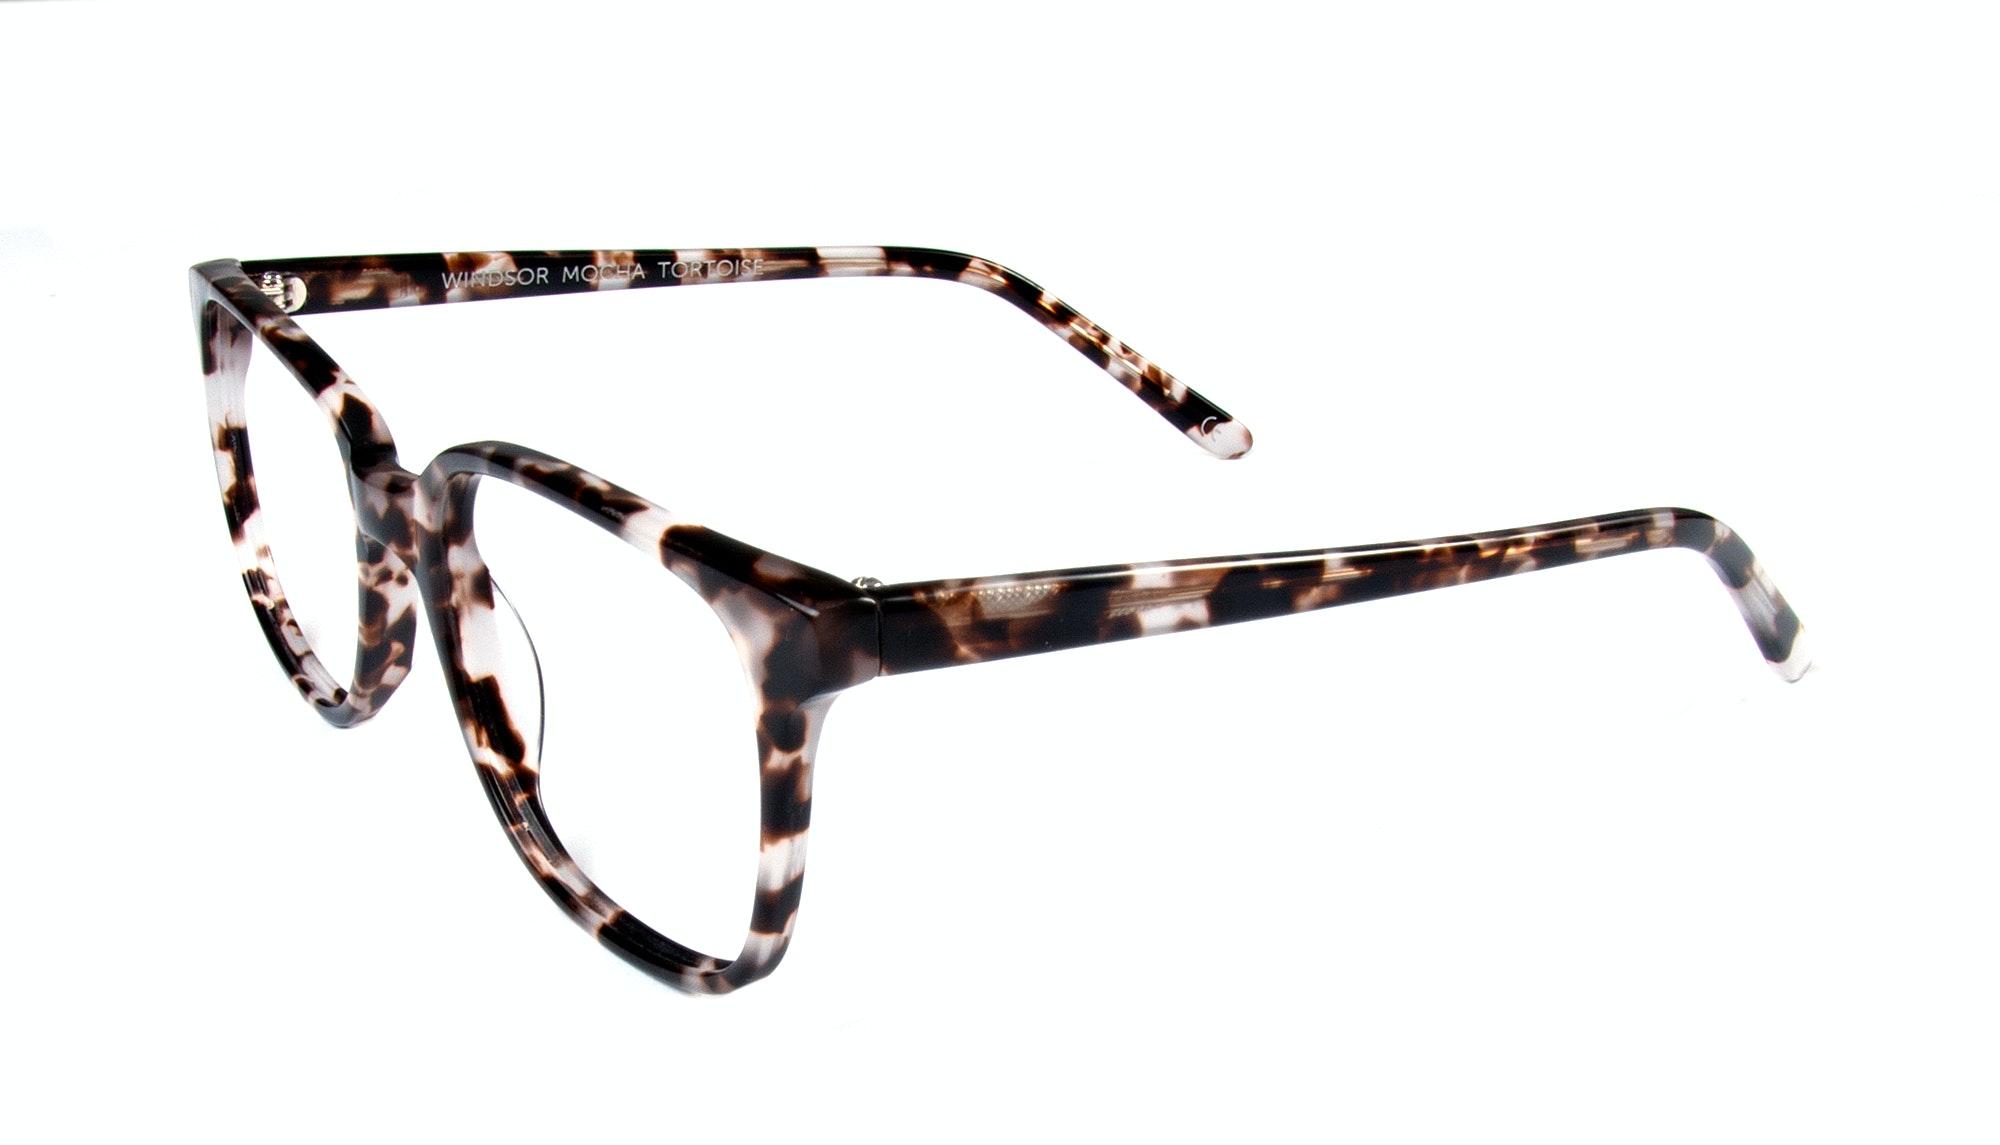 Affordable Fashion Glasses Rectangle Square Eyeglasses Women Windsor Mocha Tortoise Tilt